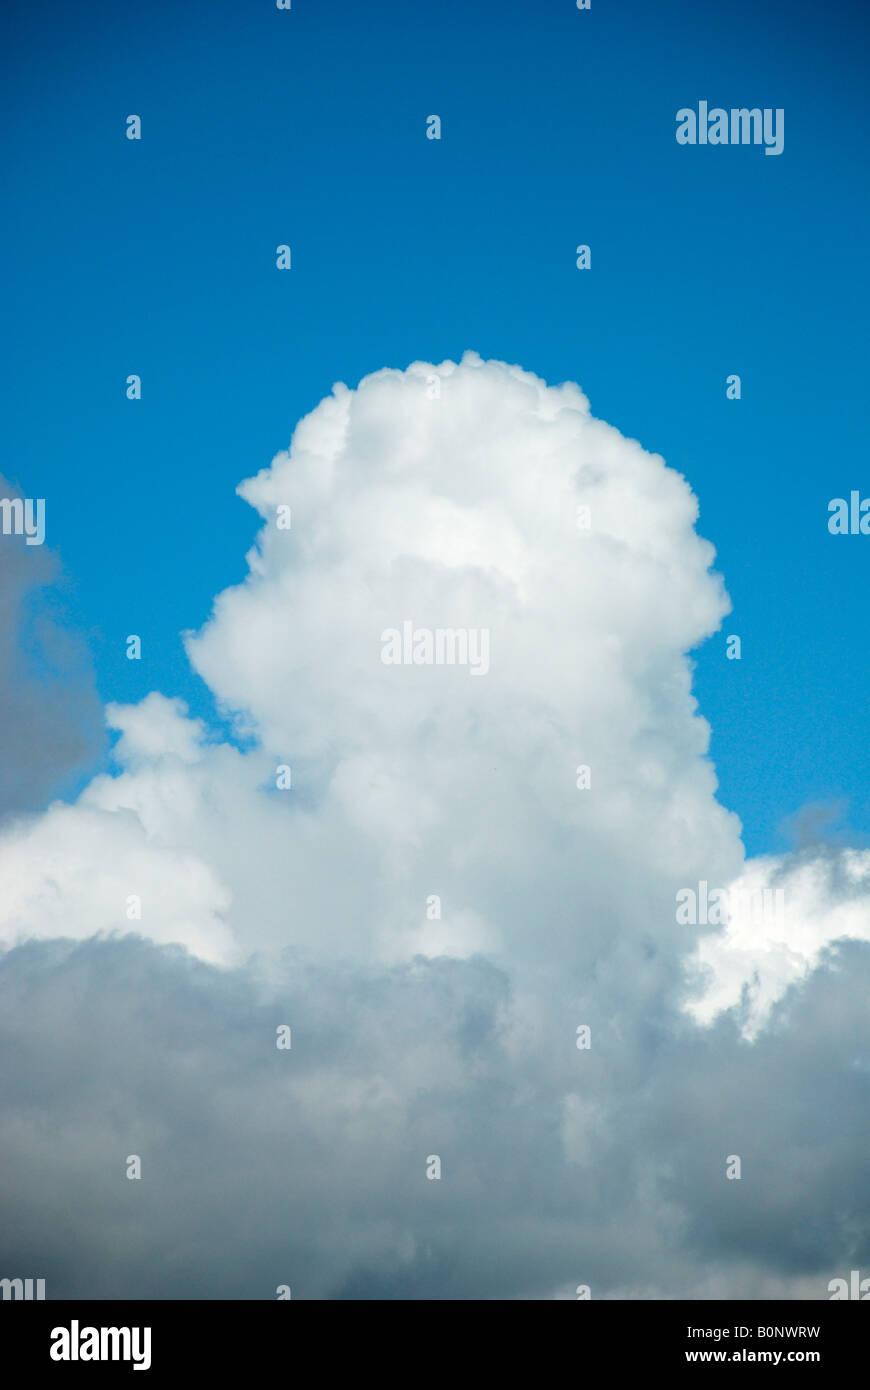 large cloud building against blue sky - Stock Image